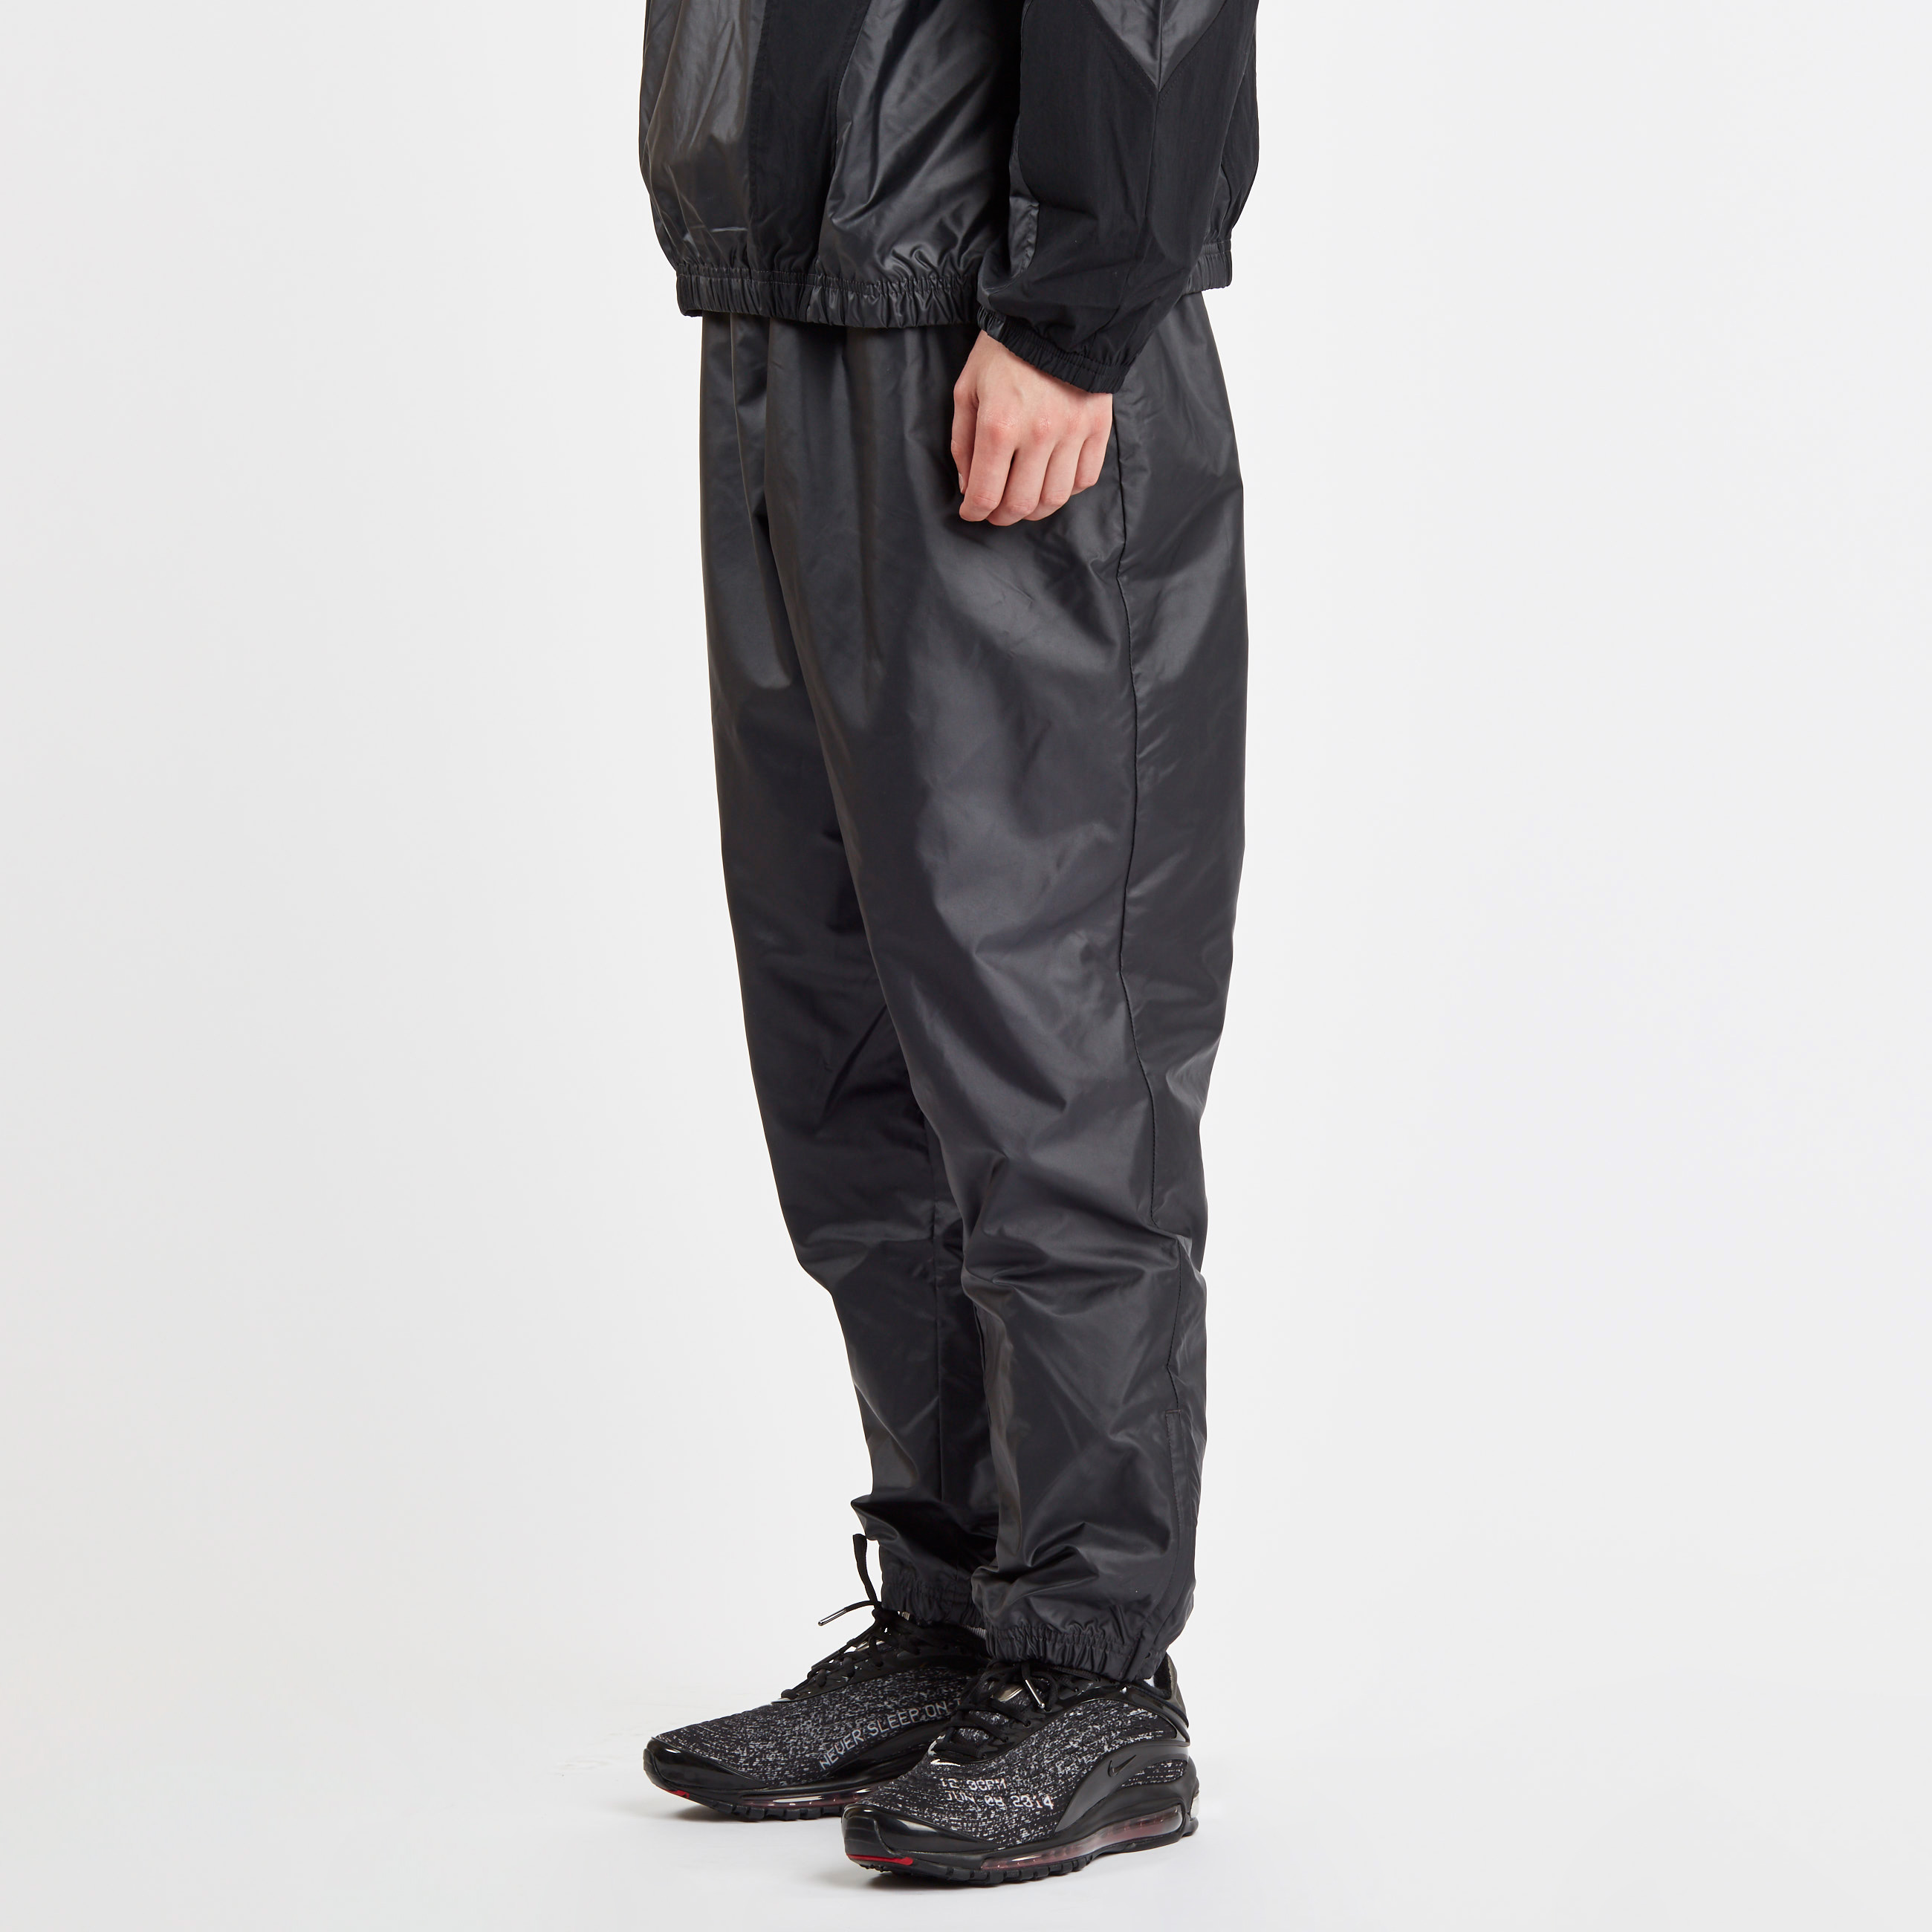 buy popular 8f349 e8900 Nike Sportswear NRG x Skepta Track Suit - 12. Close